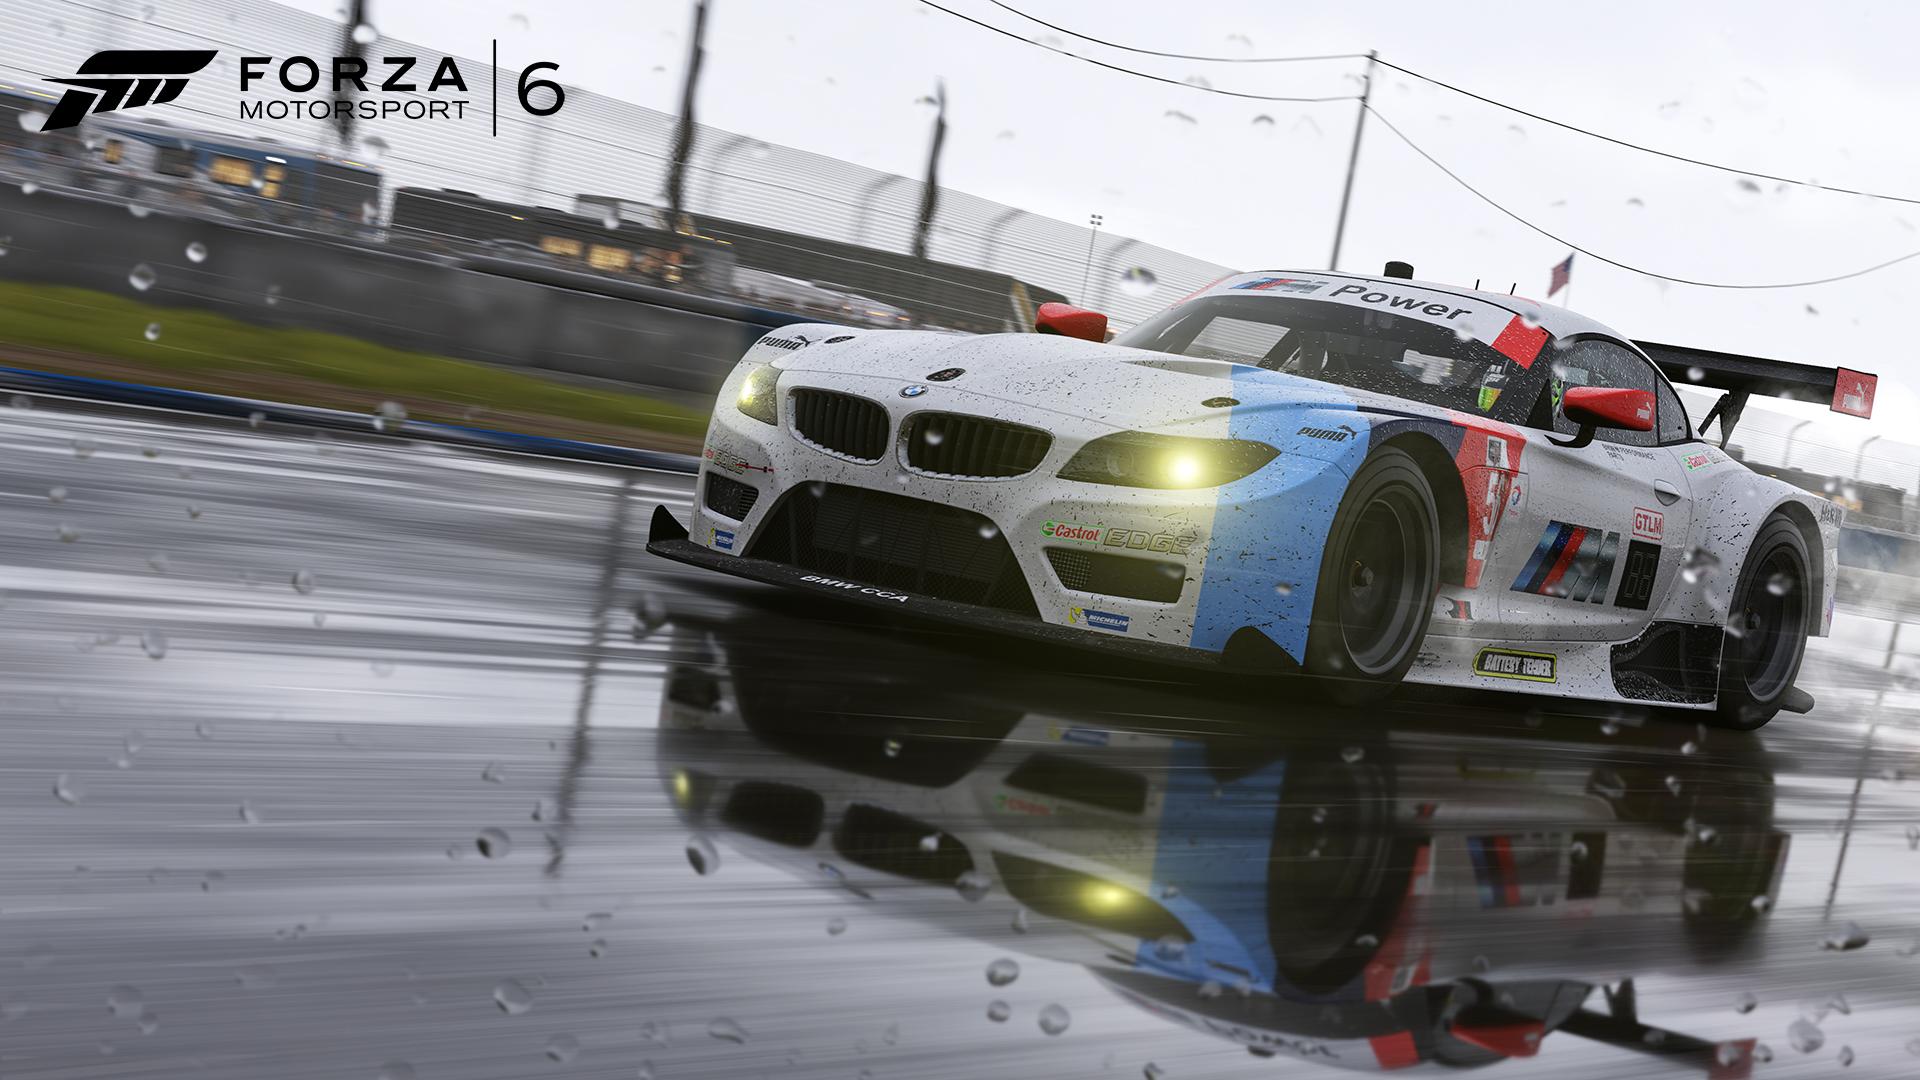 Forza Motorsport 6 - BMW M